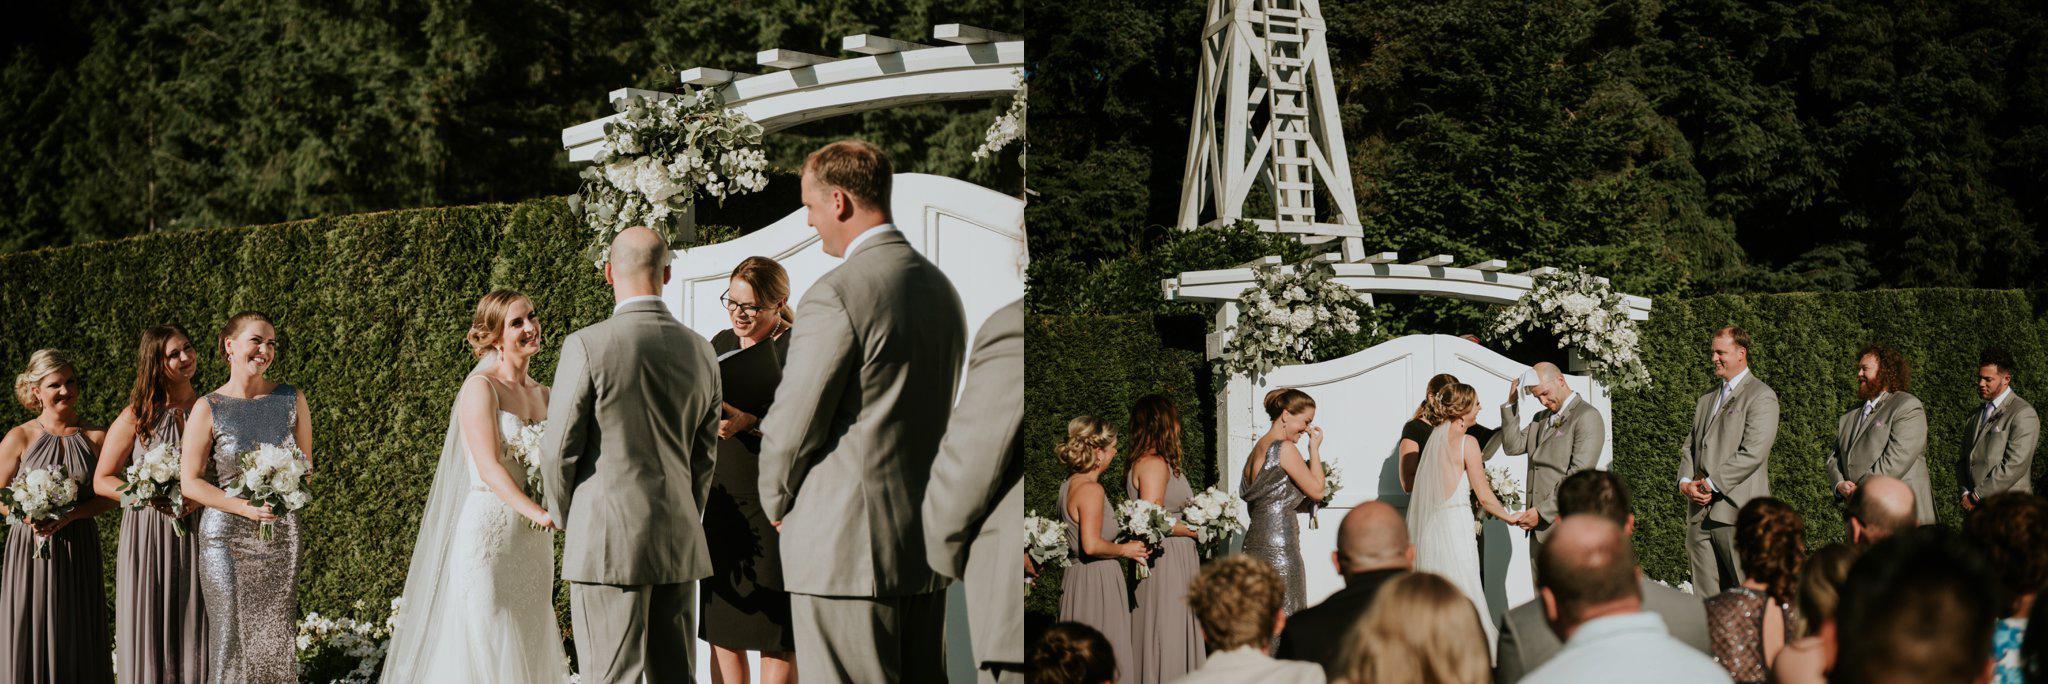 hollywood-school-house-wedding-seattle-photographer-caitlyn-nikula-75.jpg